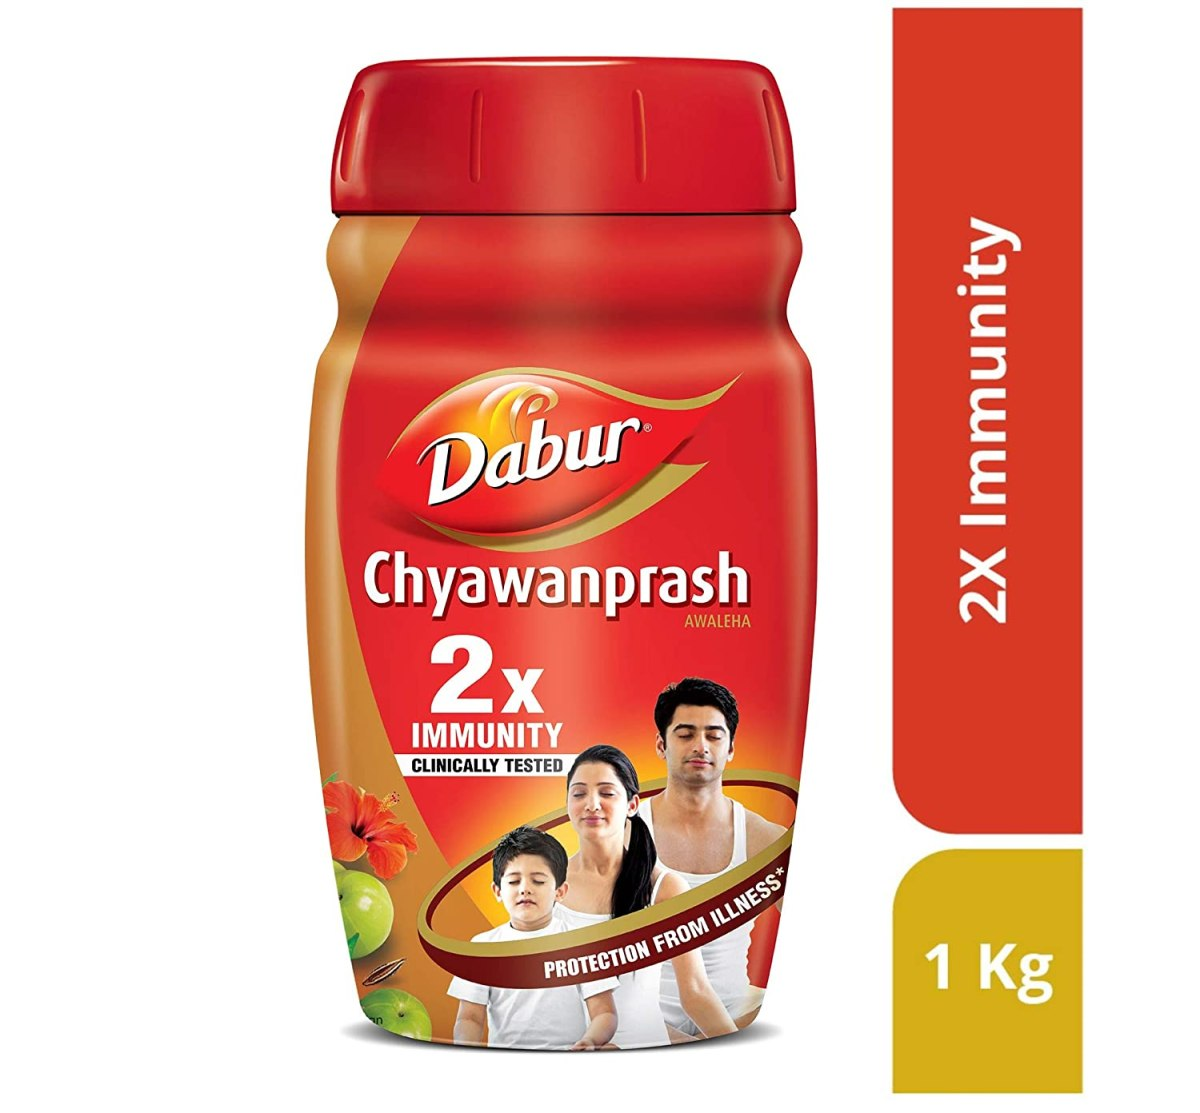 Is Dabur Chyawanprash good for health